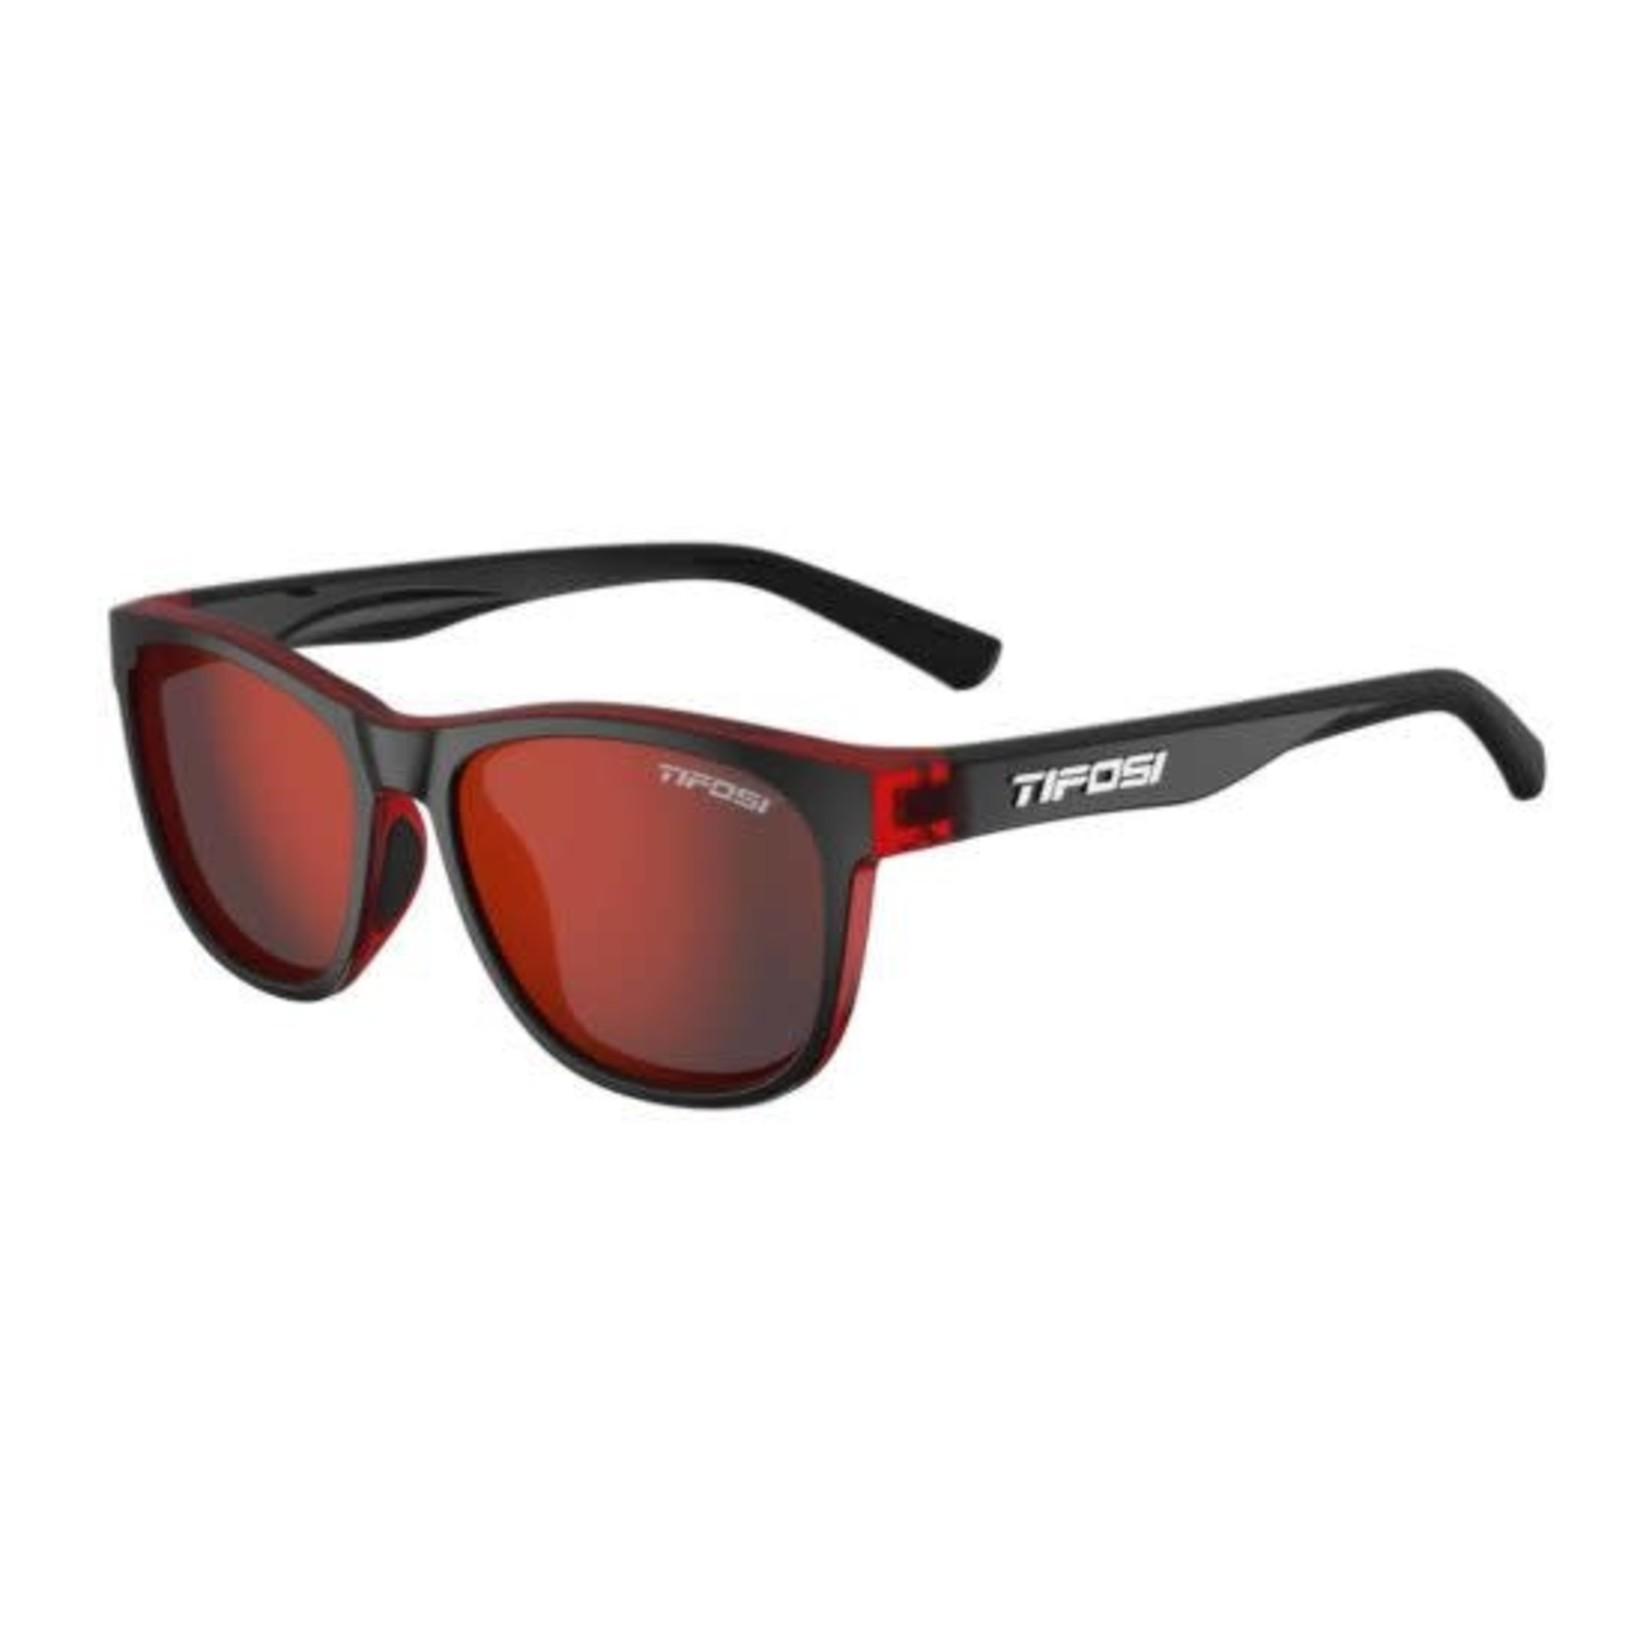 Tifosi Optics Swank, Crimson/Onyx Single Lens Sunglasses